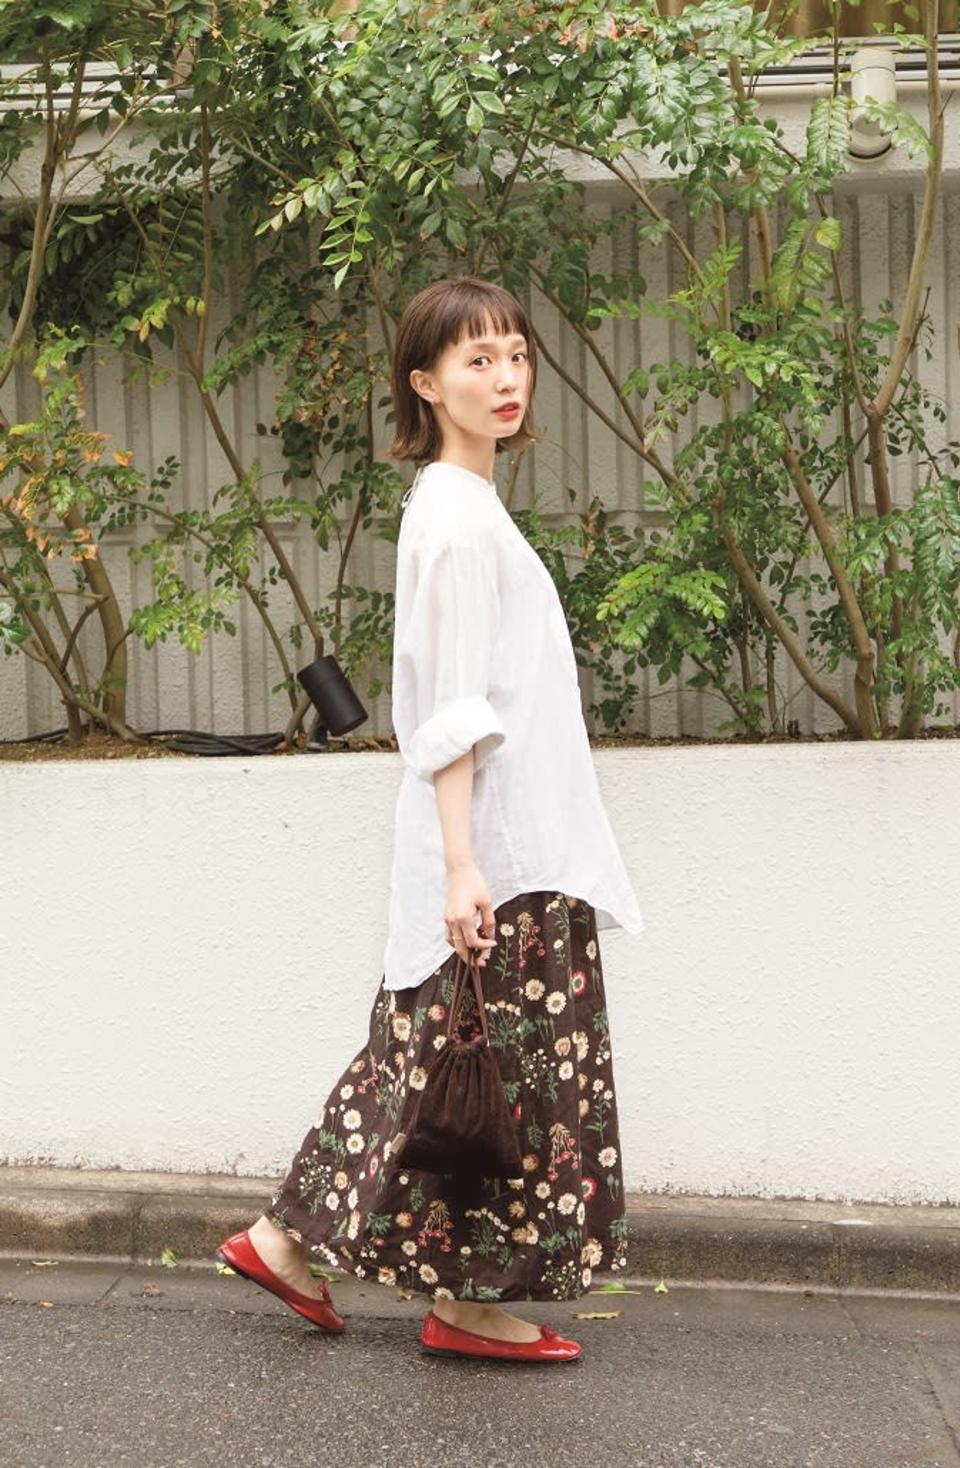 yuzu-collection-content-2818-1528866562.